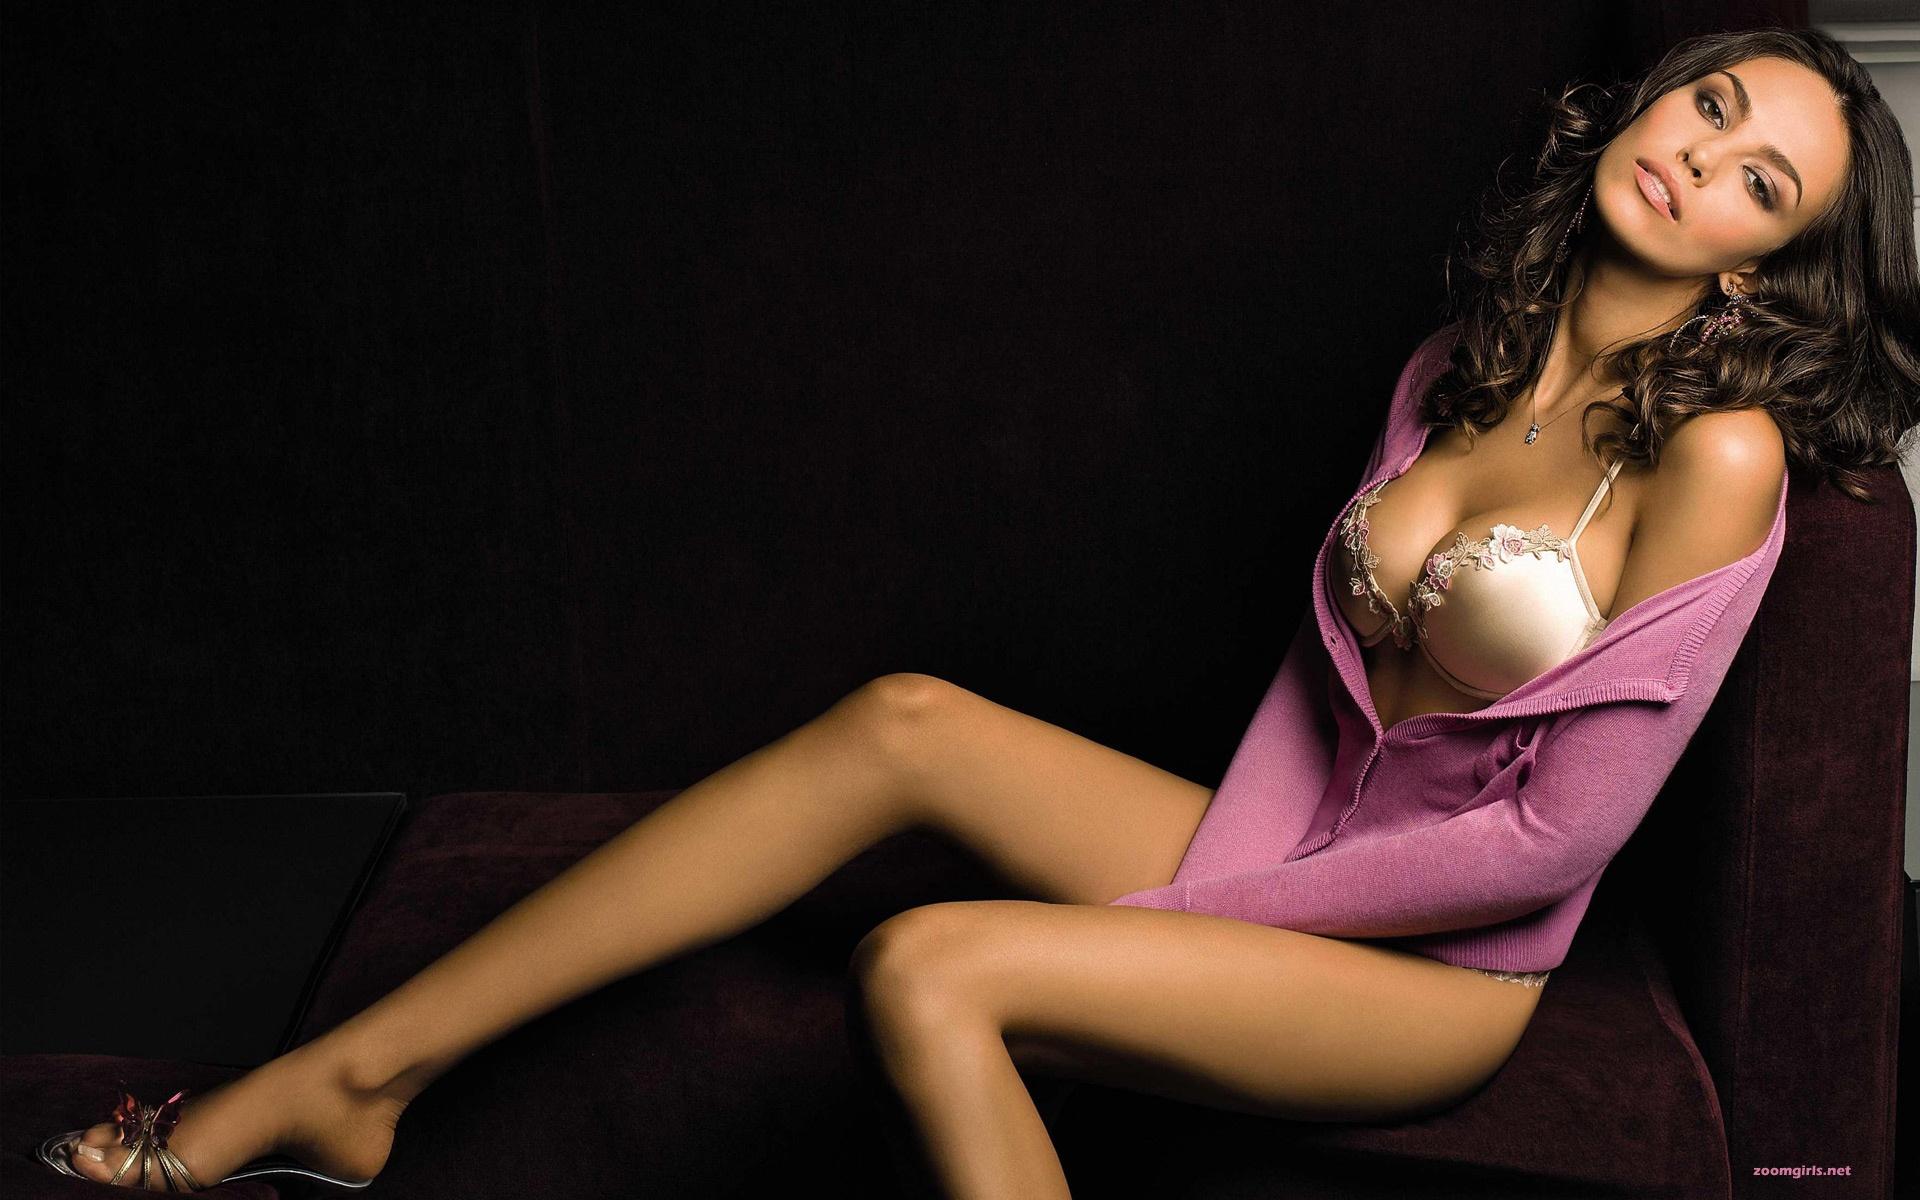 Alexis Ren Sexy - 5 Pics Video Gif,Cara delevigne sexy pics Sex pics Arianny Celeste nude. 2018-2019 celebrityes photos leaks!,Selena Gomez Shows Her Nip Pasties While Going Full Lesbodyke At The VMAs